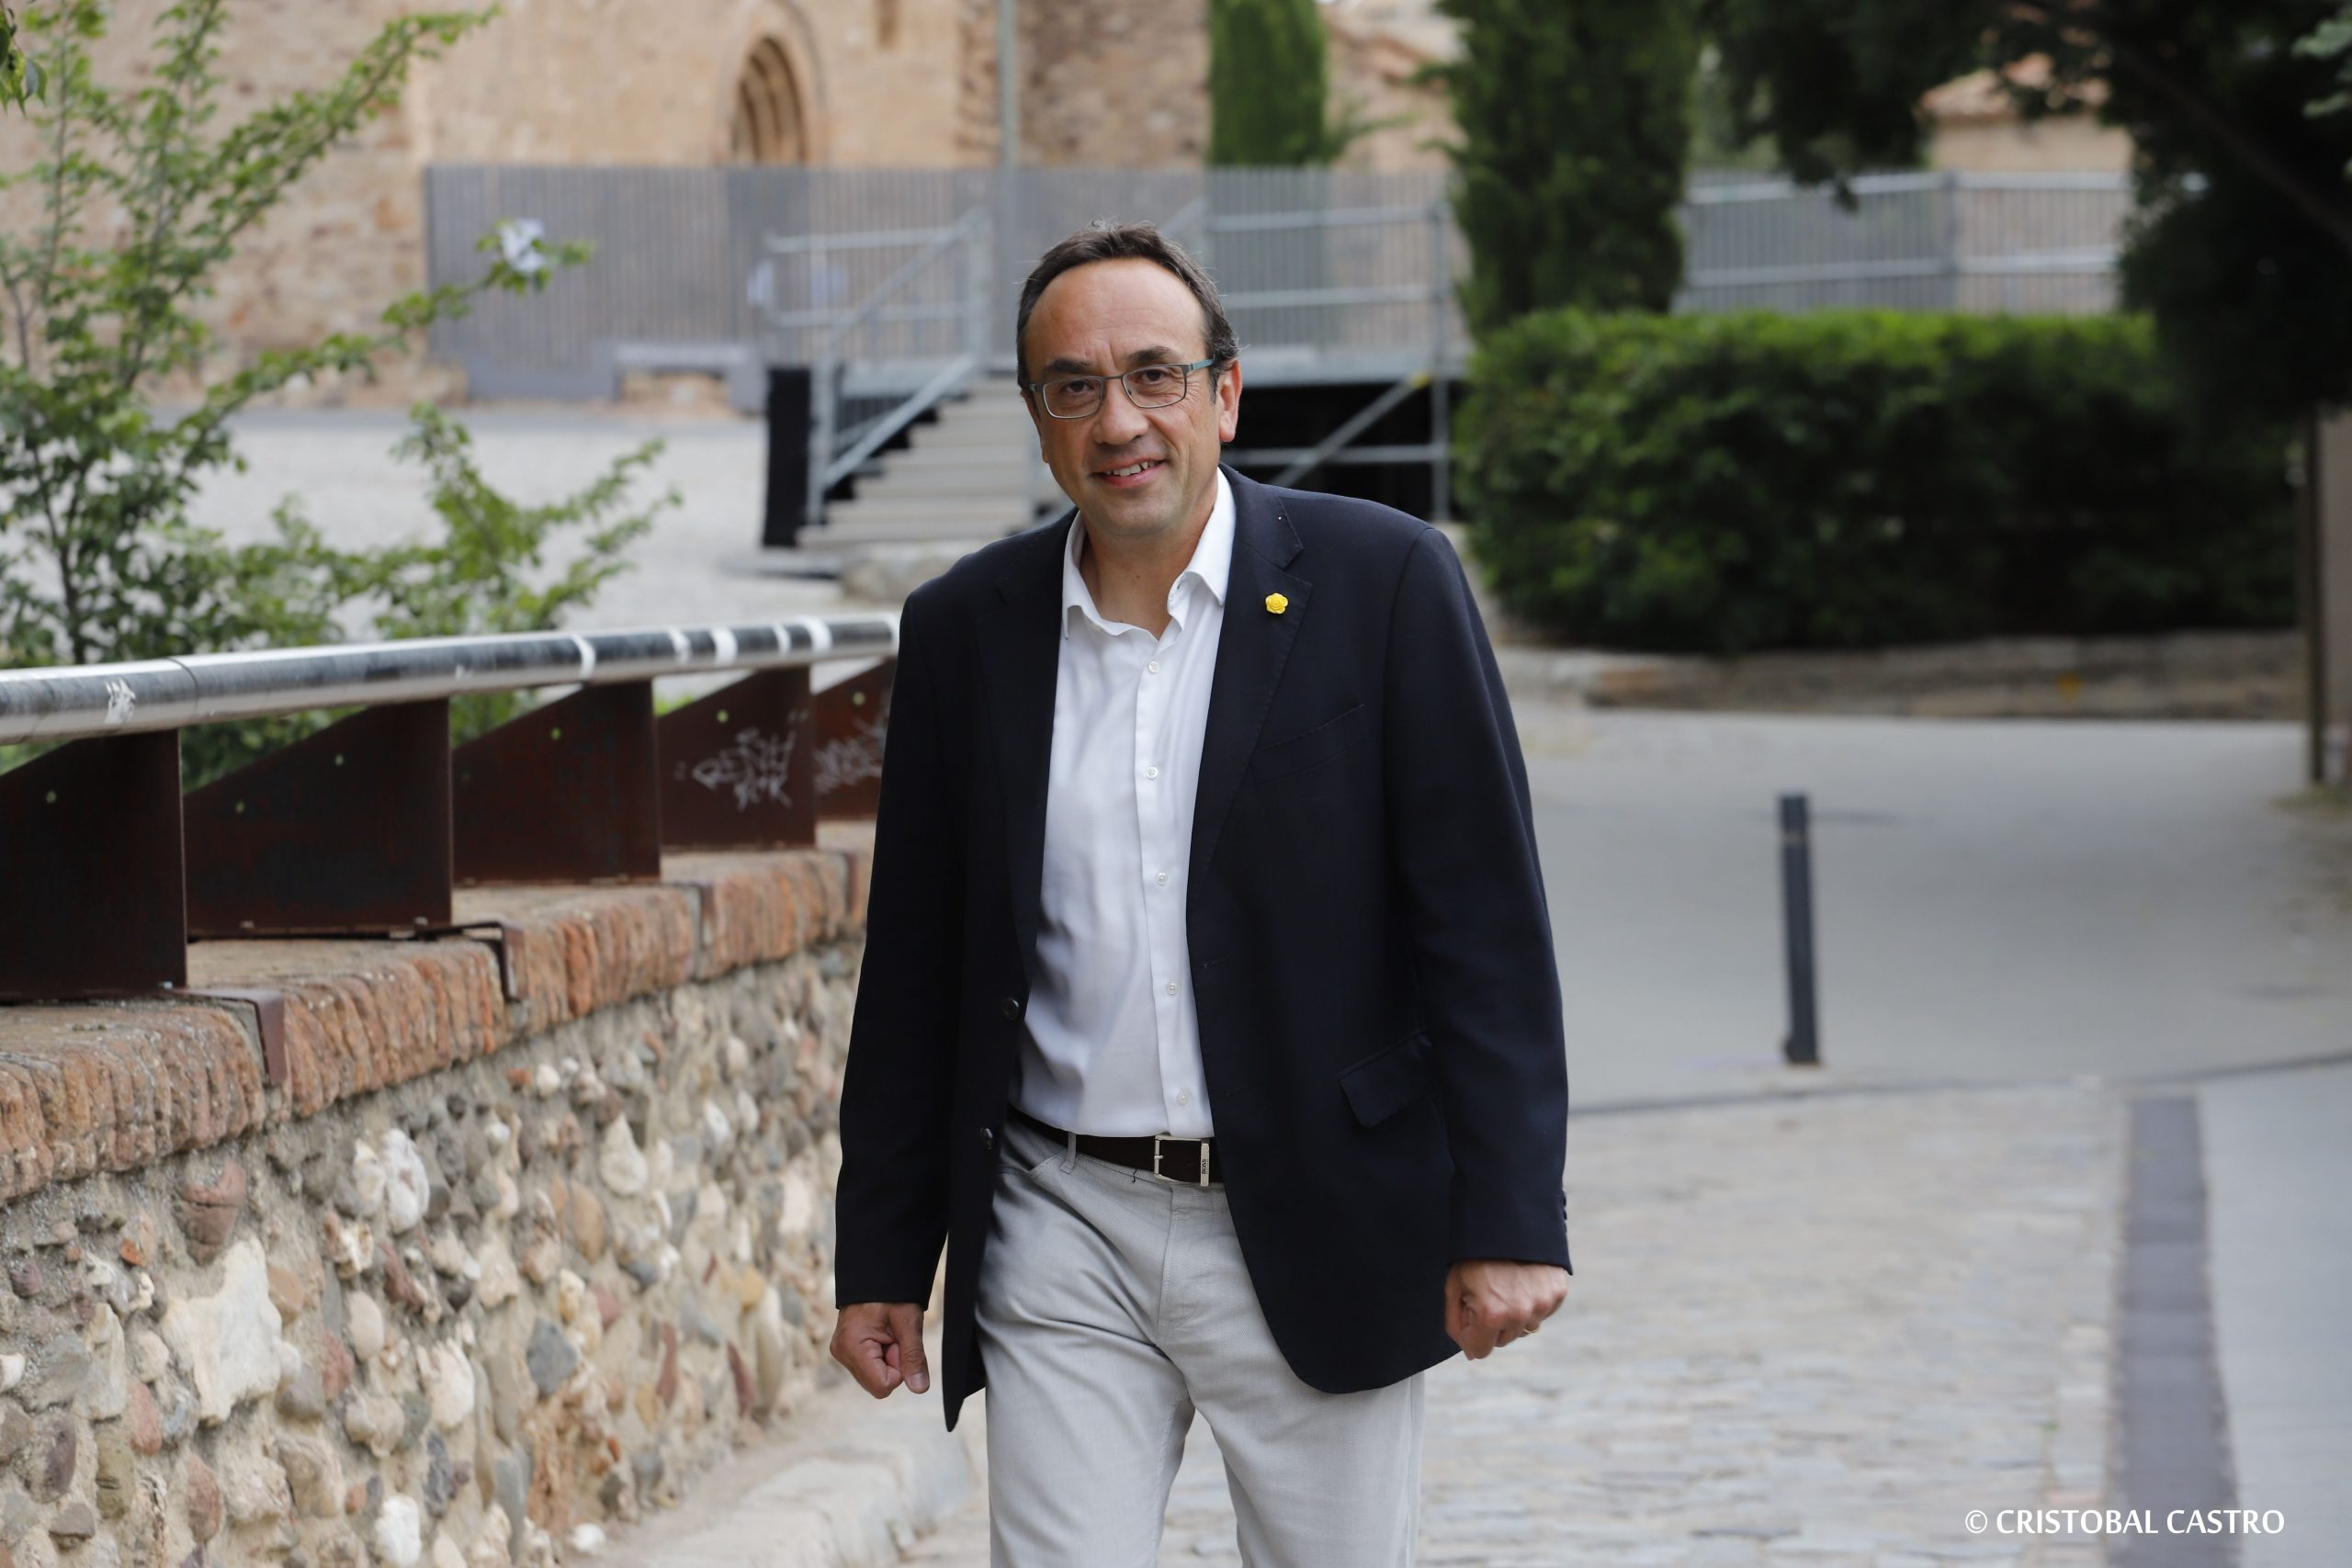 Josep Rull/Cristóbal Castro